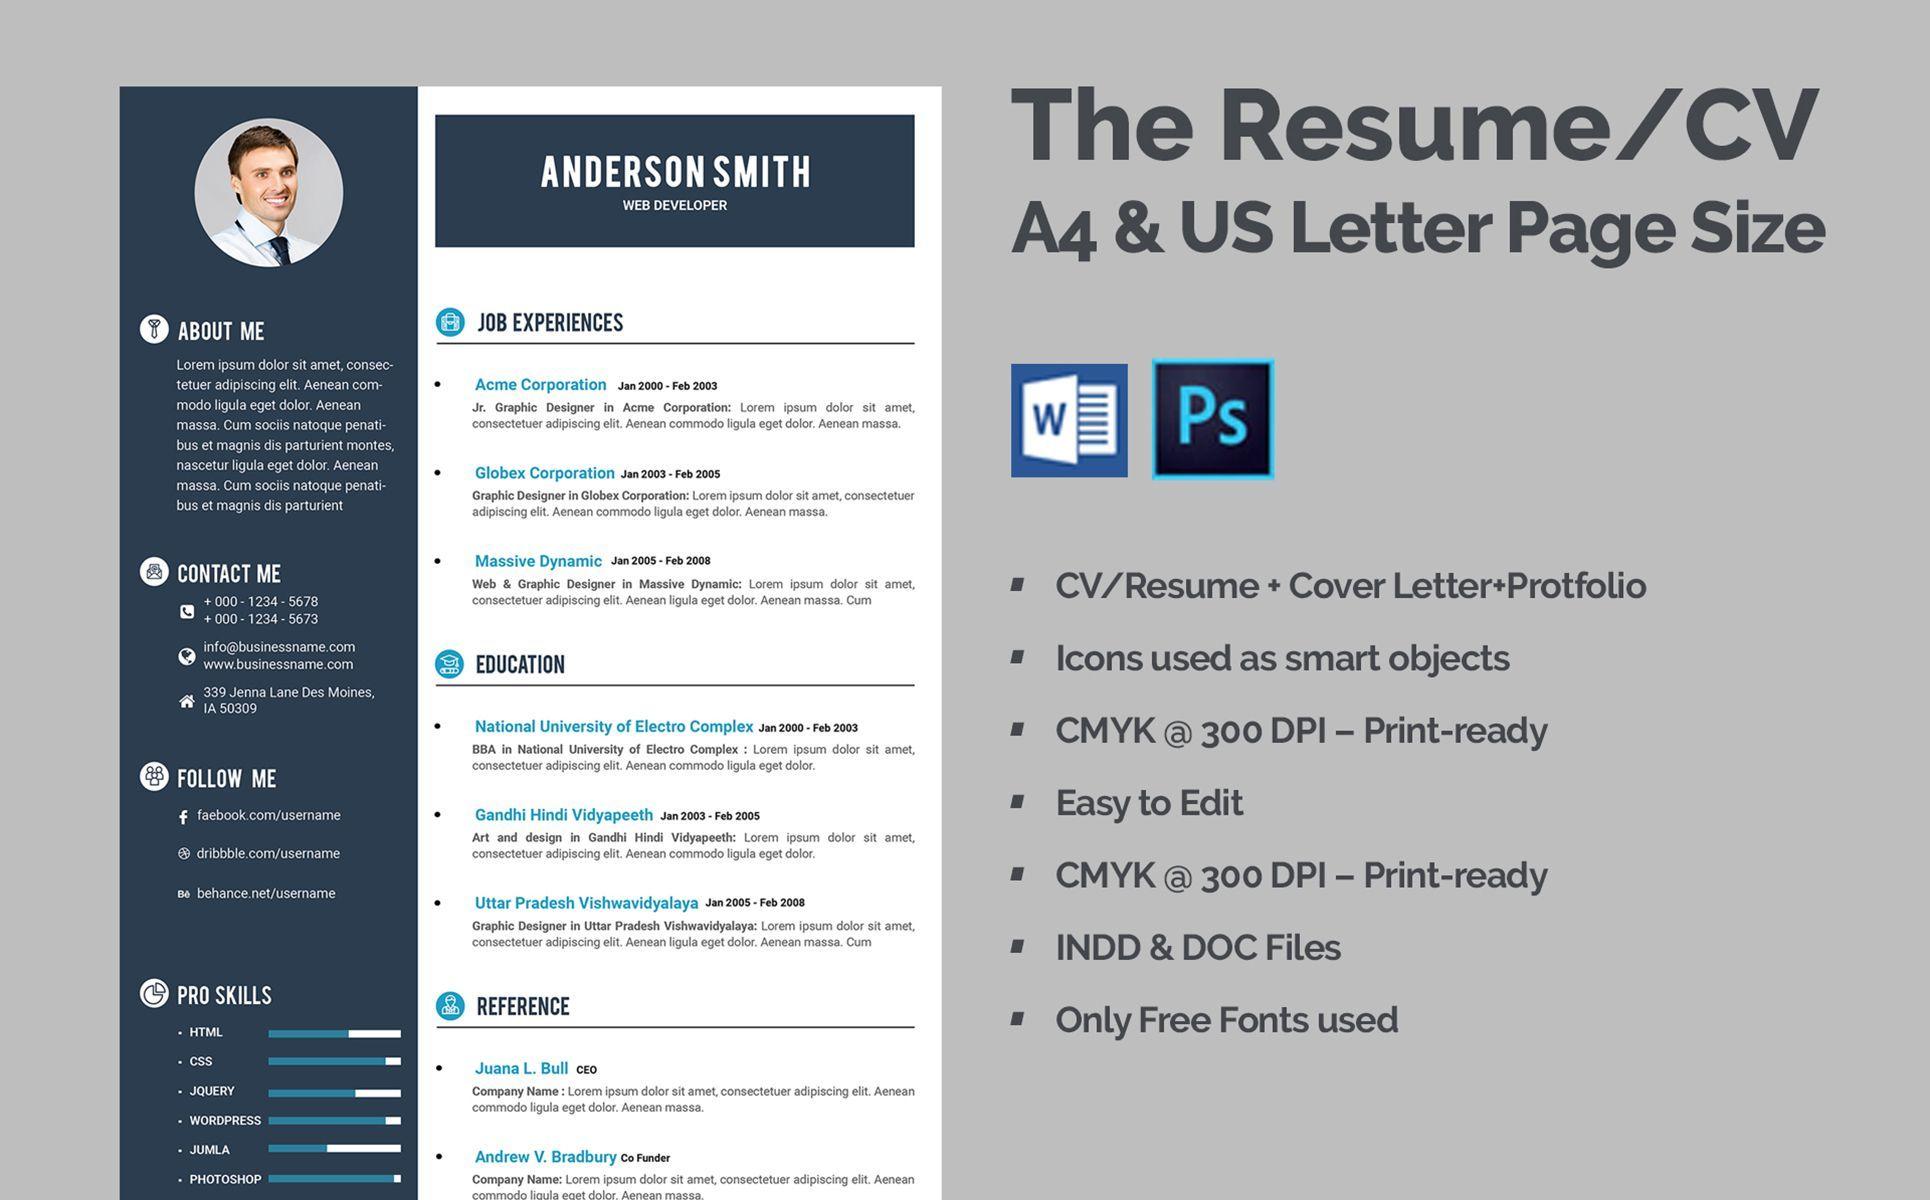 Web developer cv resume template 68317 web developer